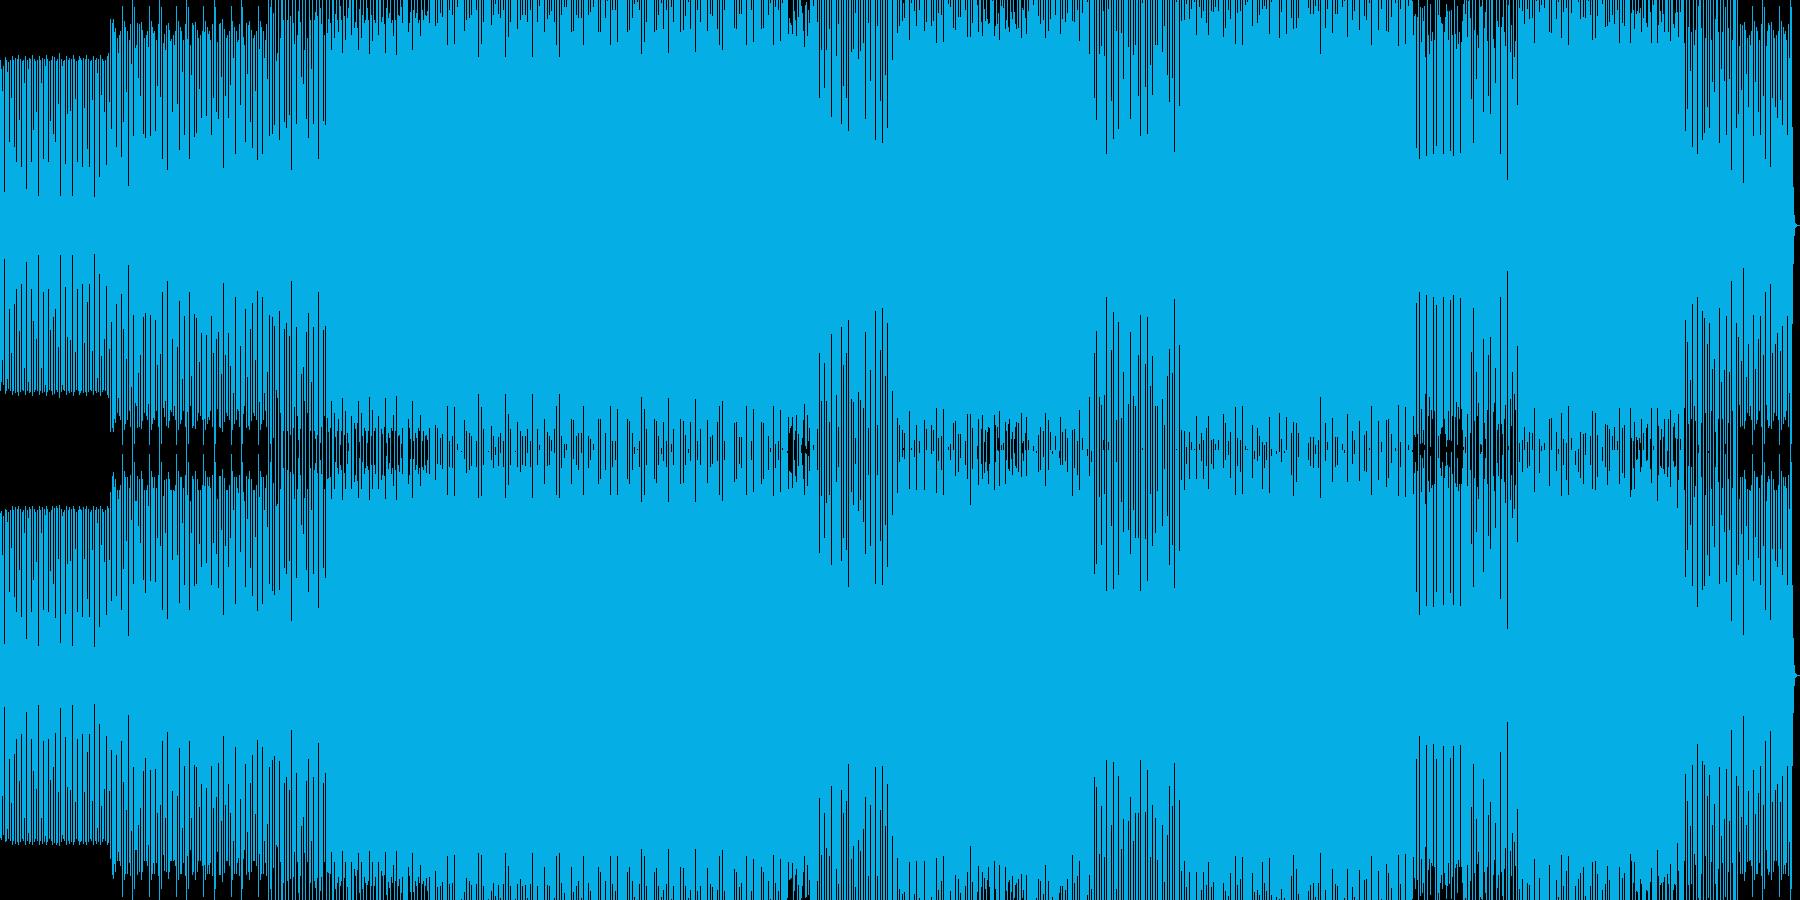 minimal house 6 の再生済みの波形